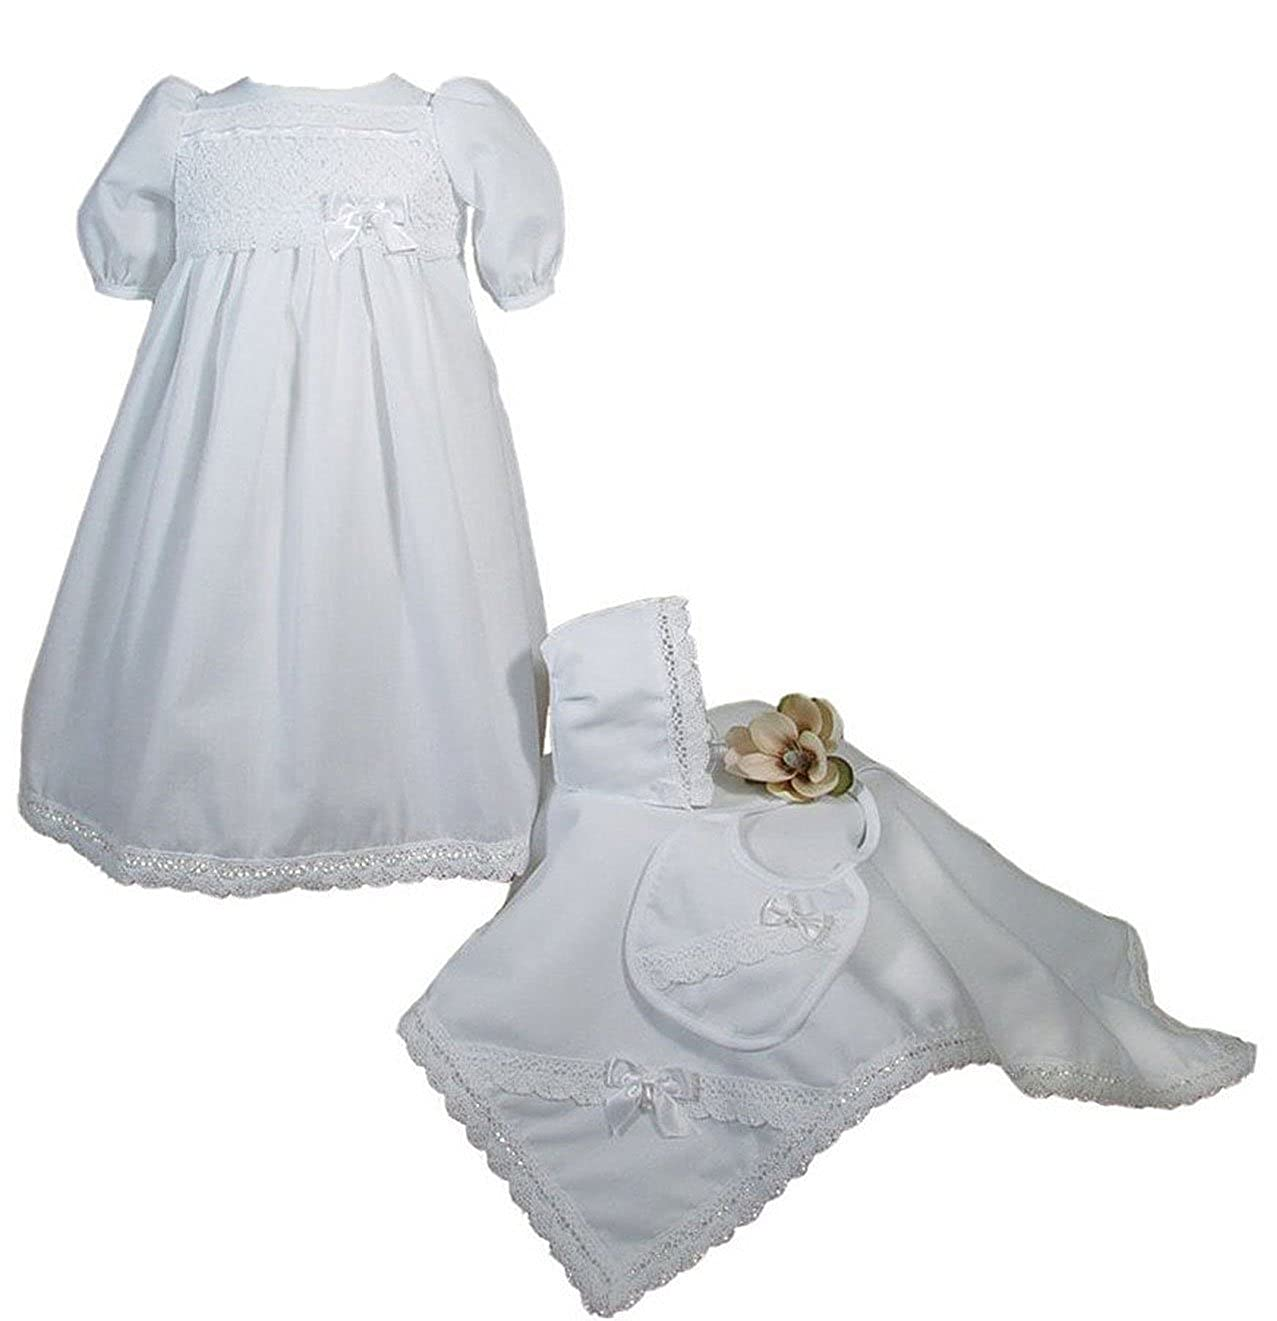 White Long Sleeve Boys Cotton Interlock Preemie Christening or Burial 4 Piece Set